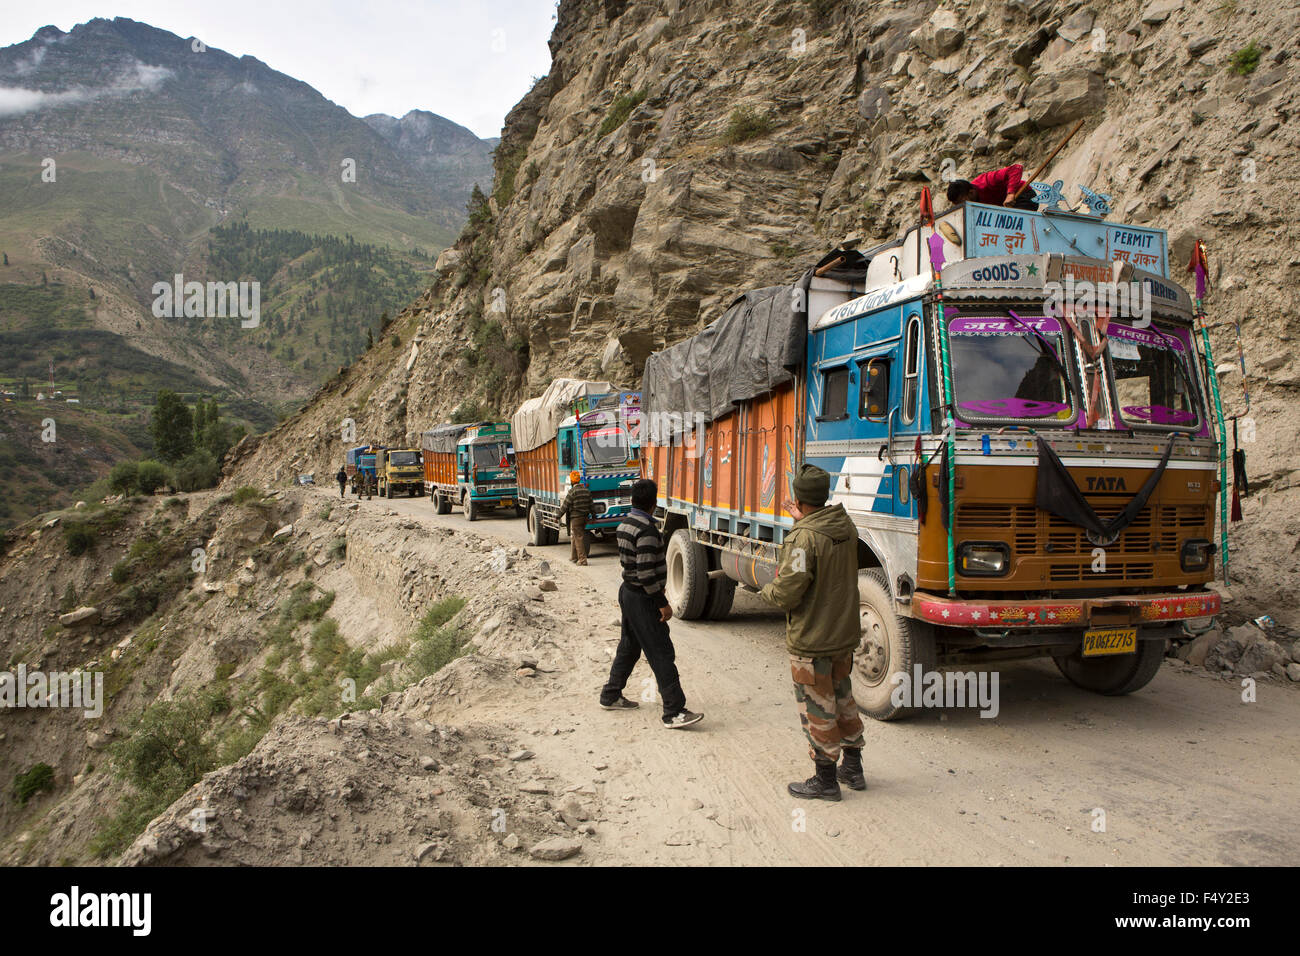 India, Himachal Pradesh, Lahaul and Spiti, Keylong, queue of trucks blocking narrow mountain road - Stock Image